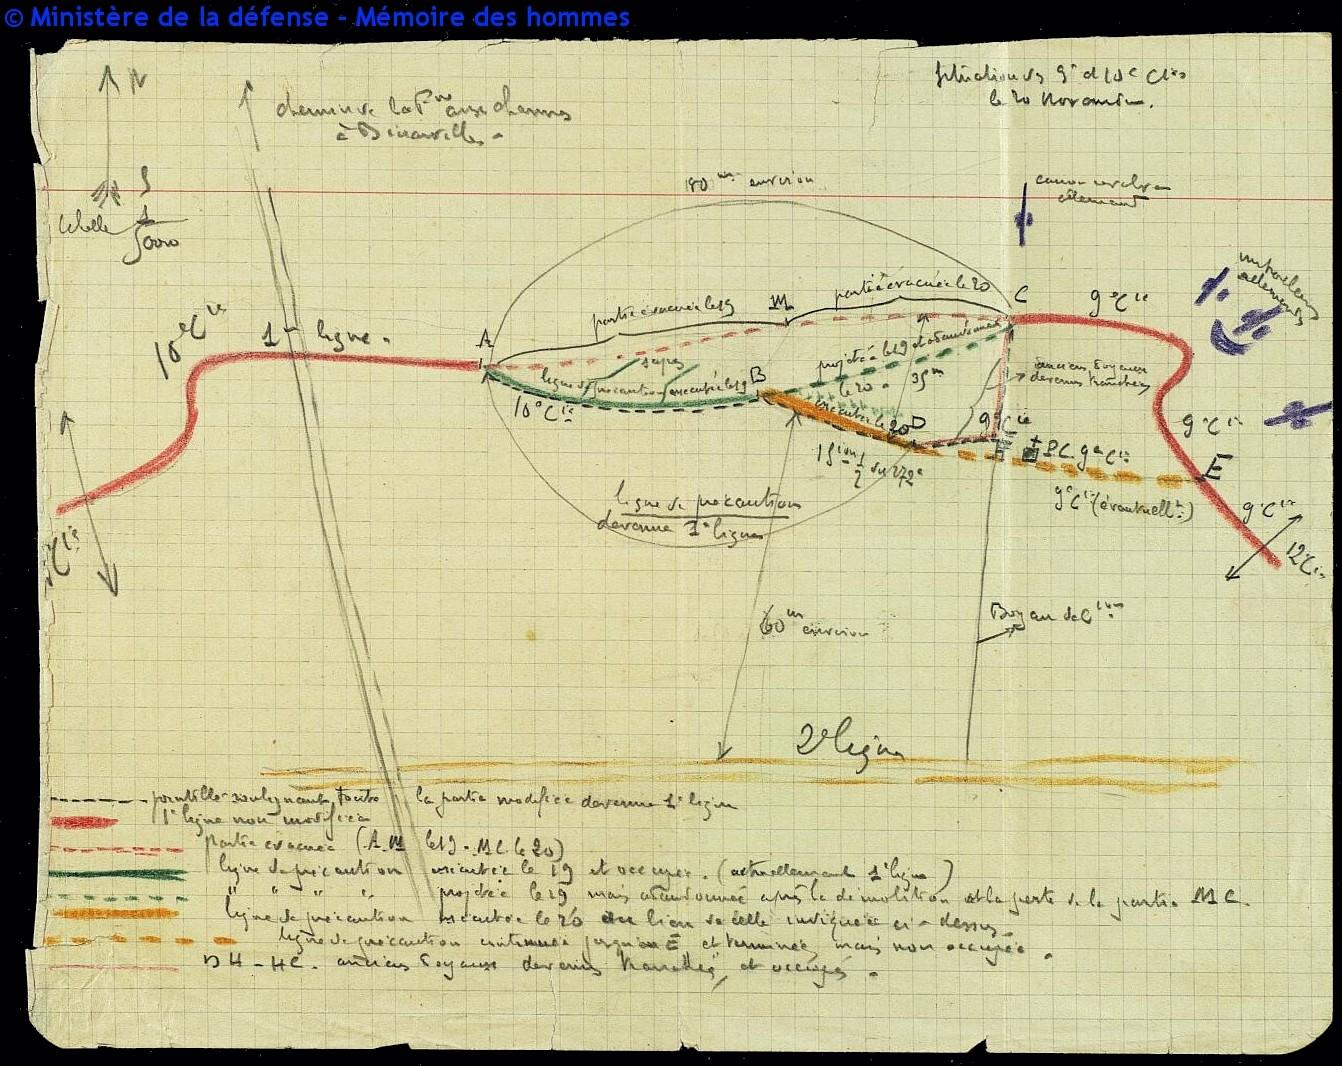 28 nov 1914 archives_SHDGR__GR_26_N_695__011__0036__T